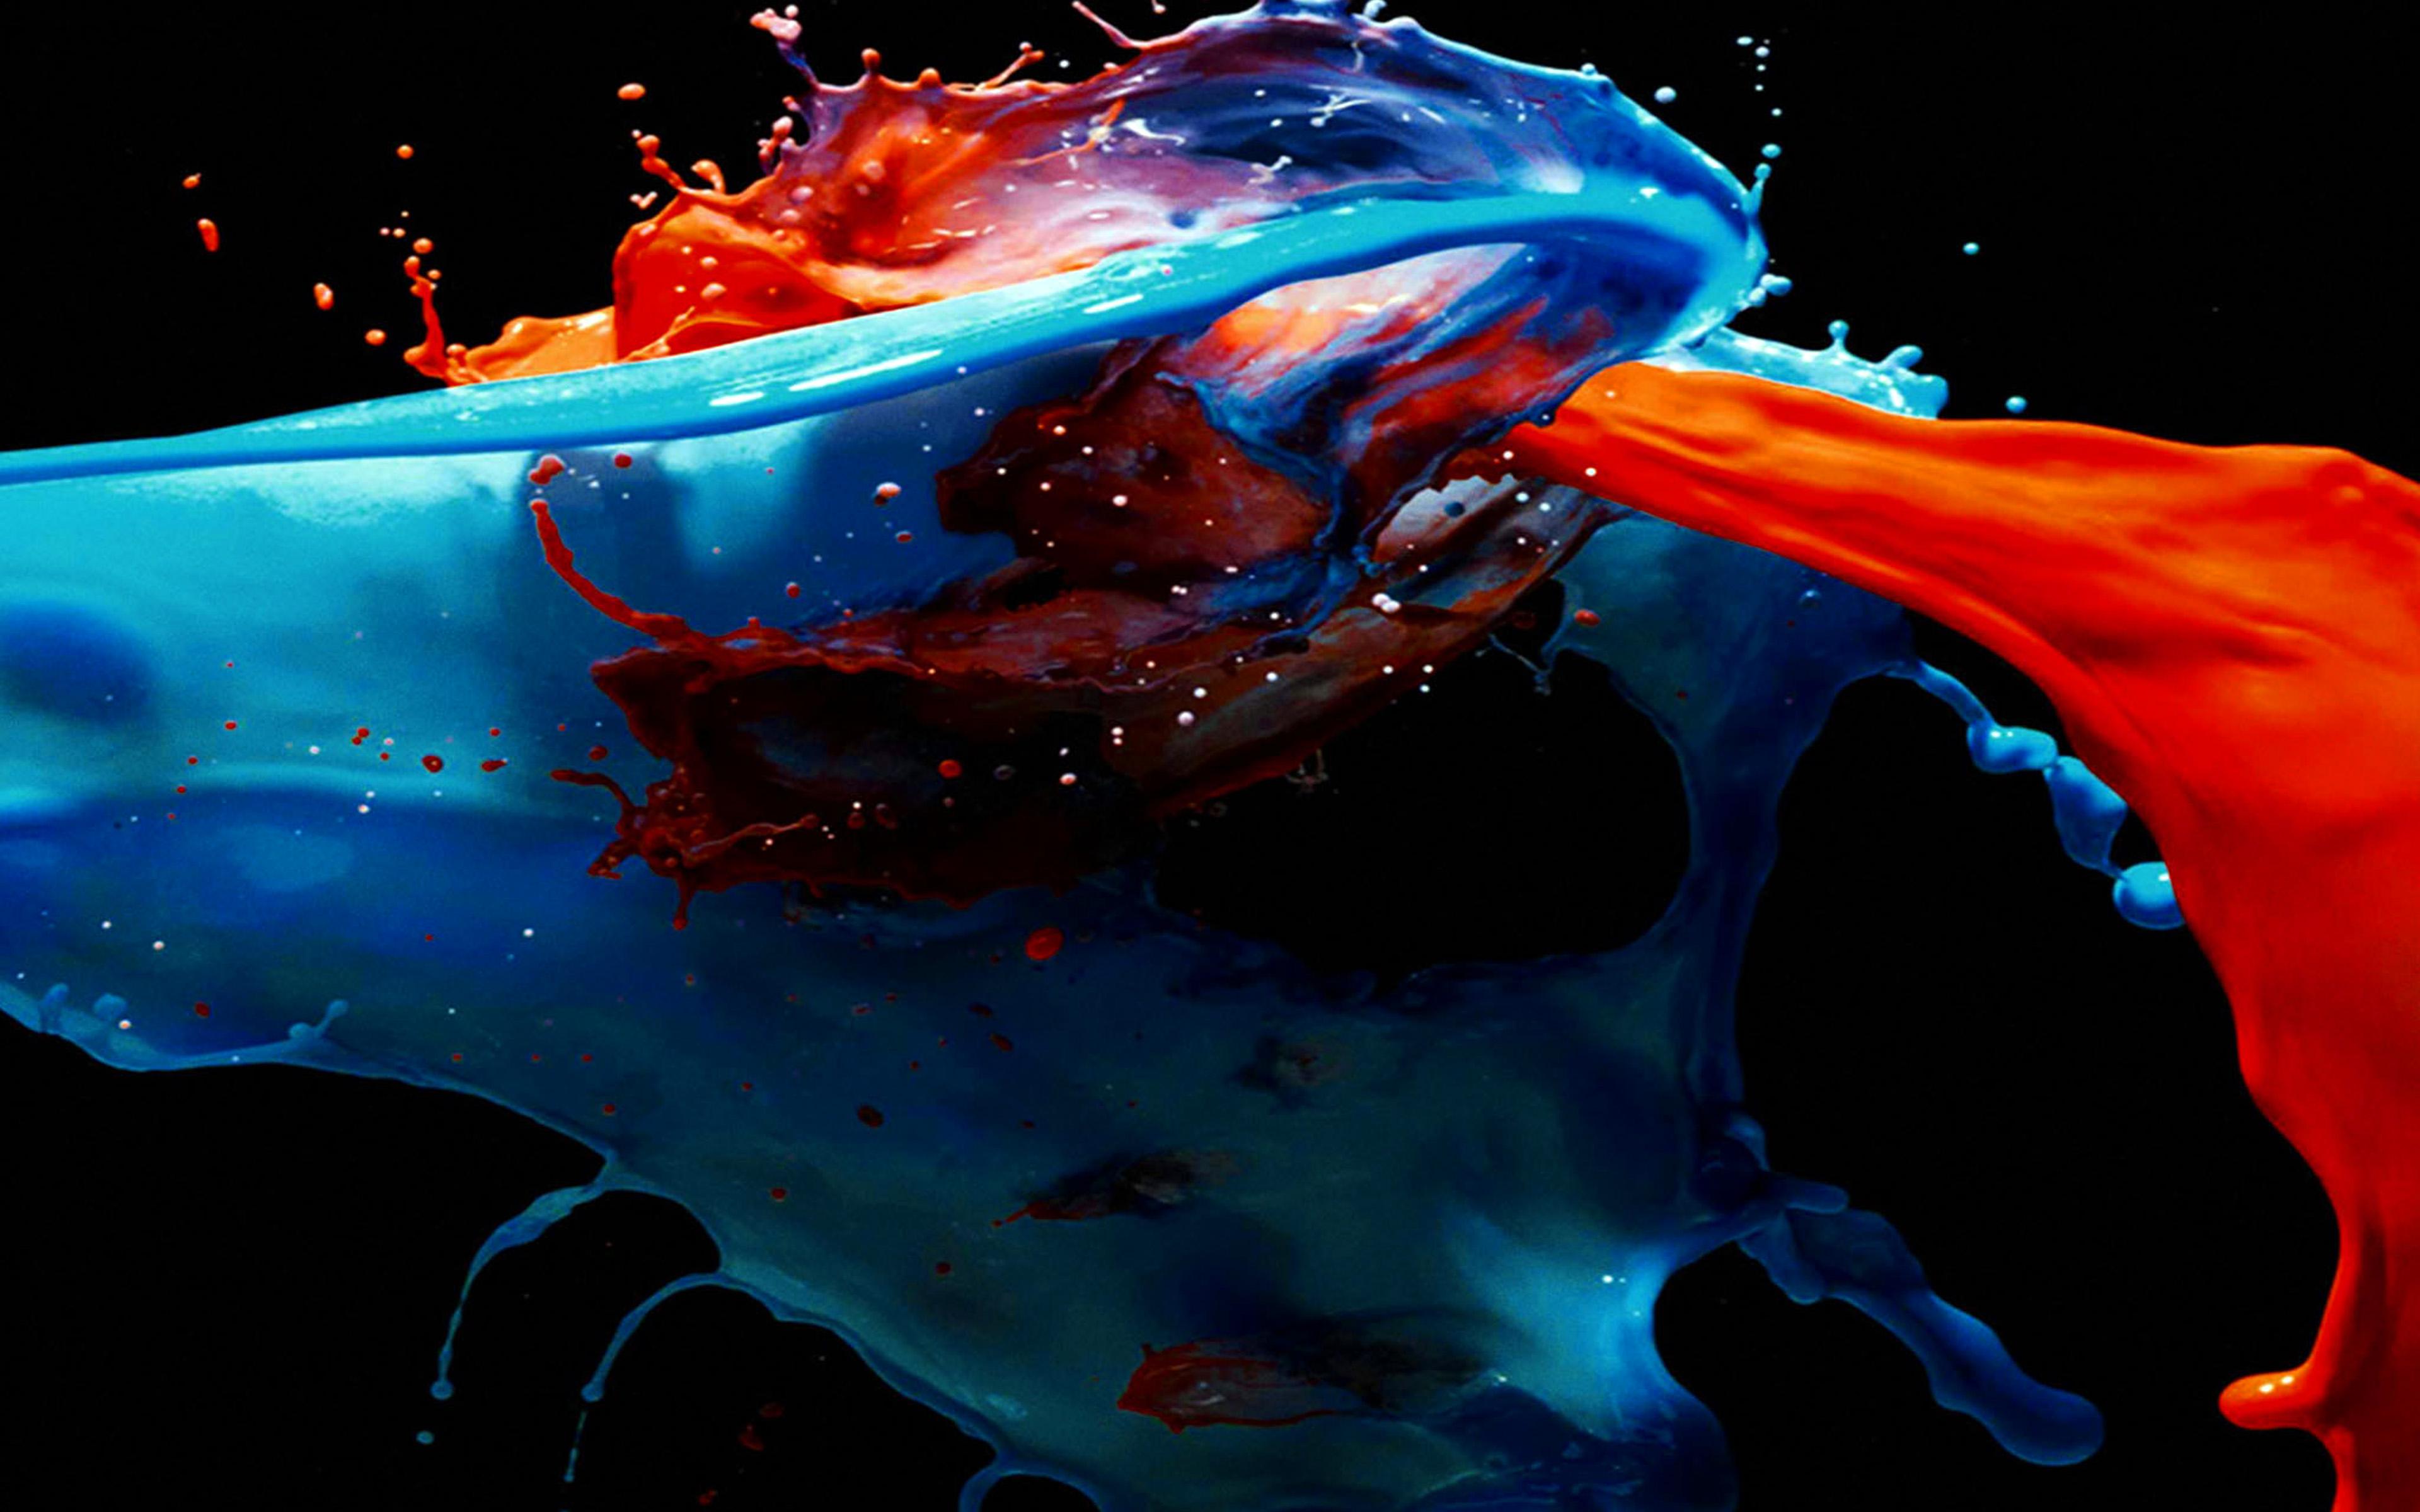 am91-paint-splash-art-illust-dark-blue-red - Papers.co